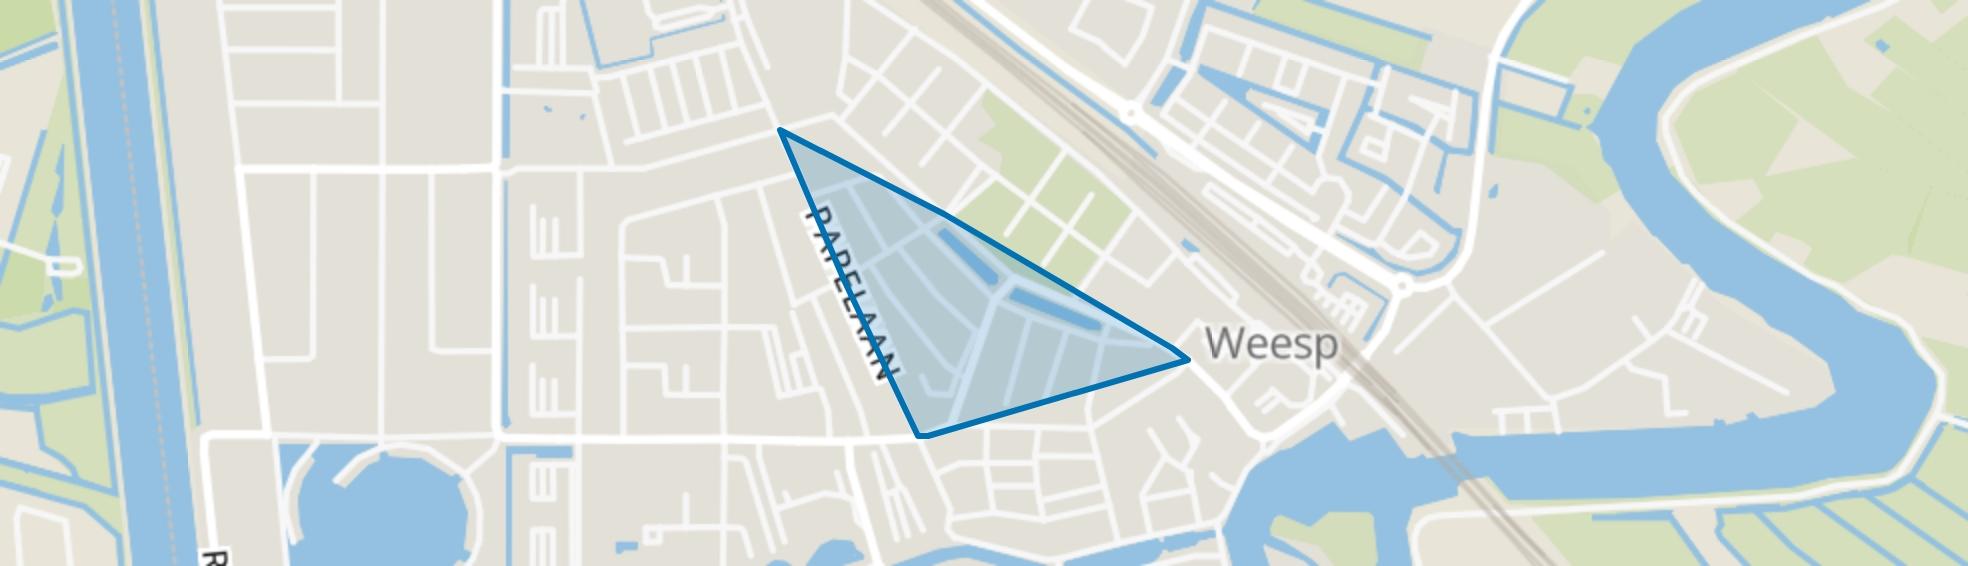 Schildersbuurt, Weesp map